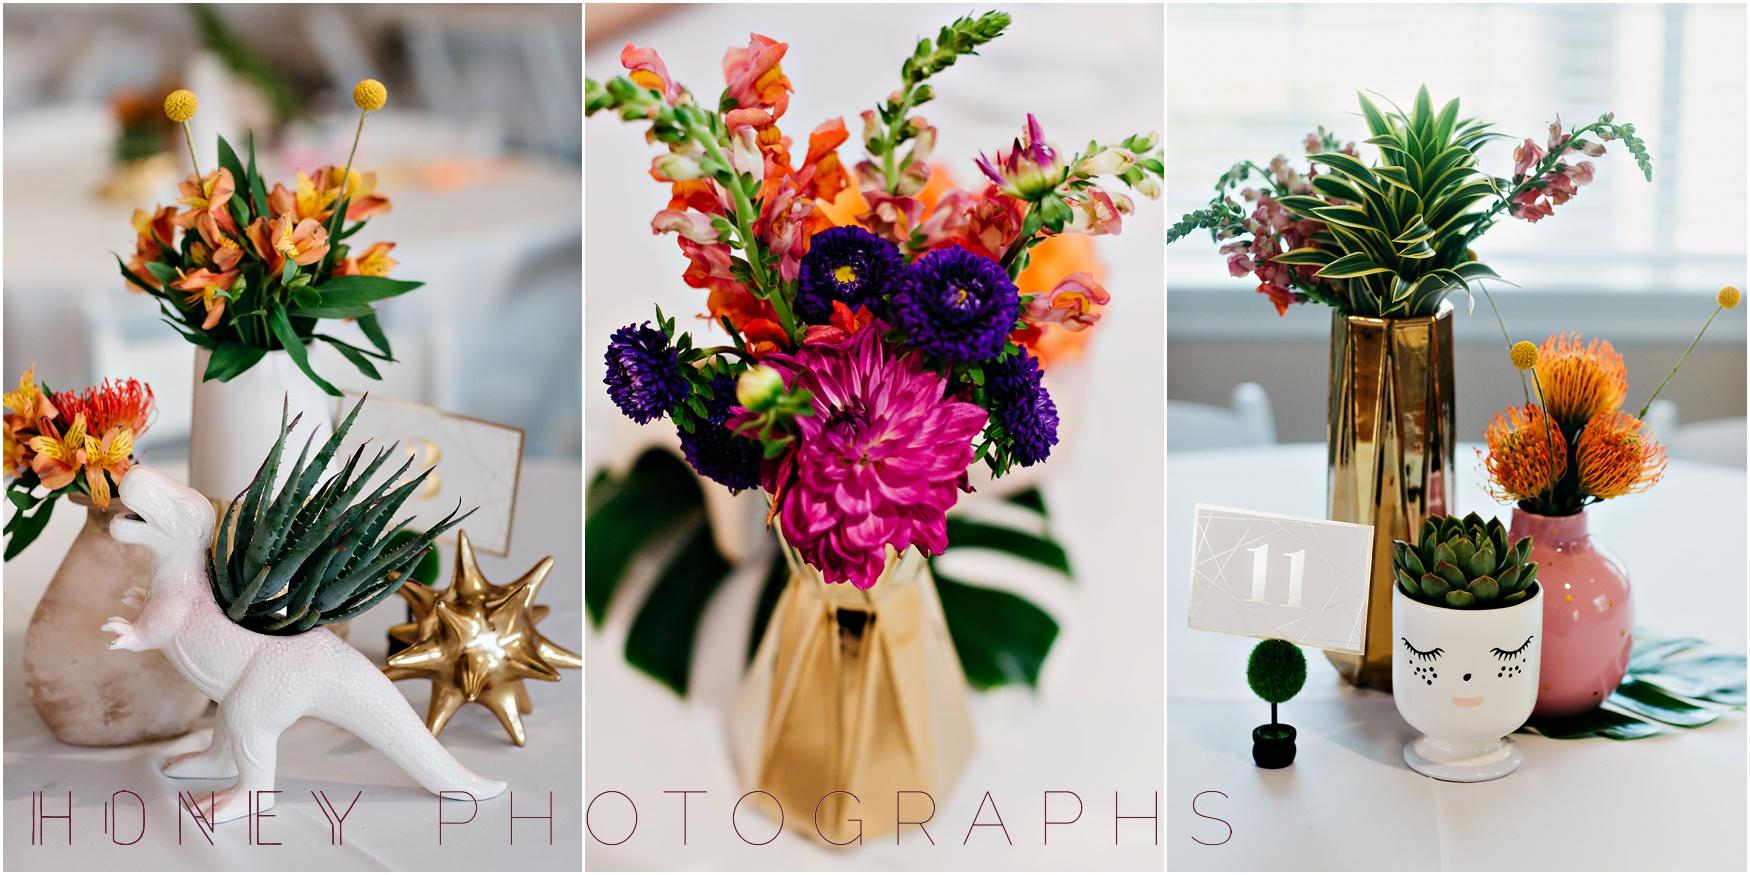 colorful_ecclectic_vibrant_vista_rainbow_quirky_wedding042.jpg